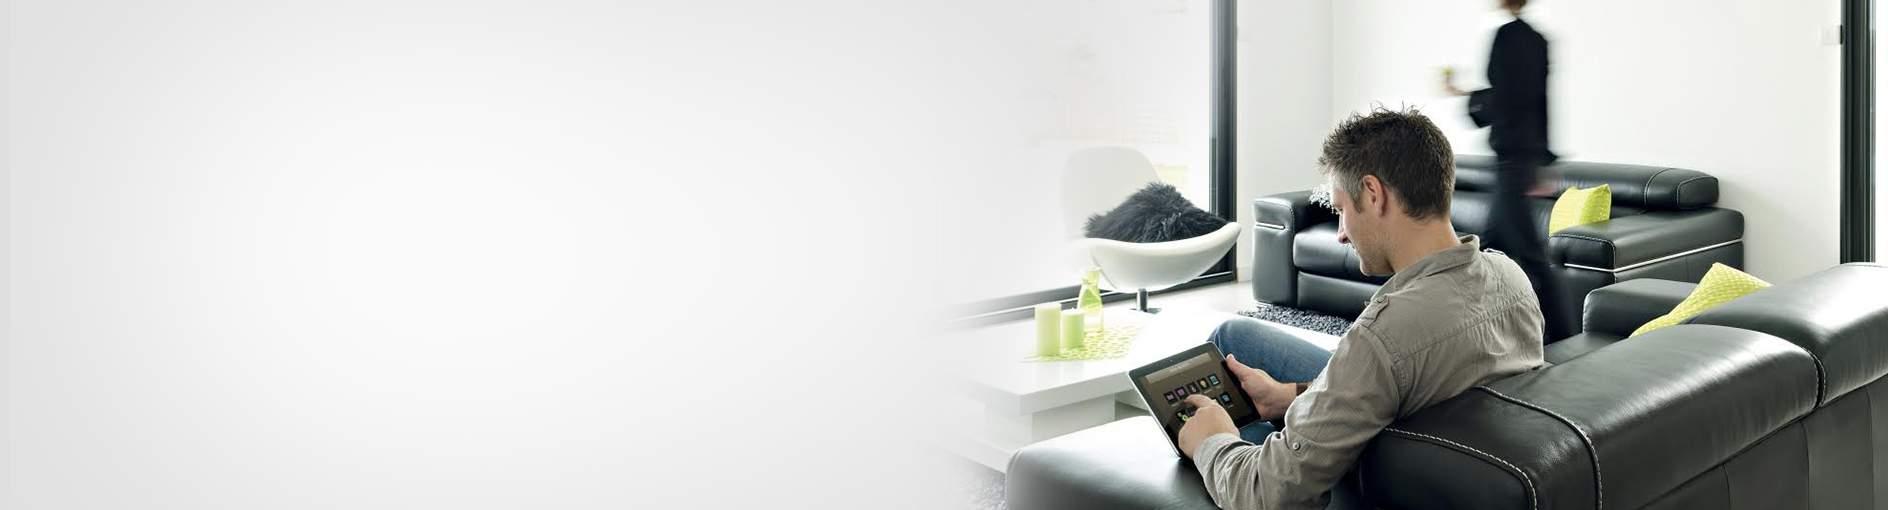 INTELLI HEAT Man on sofa using APP